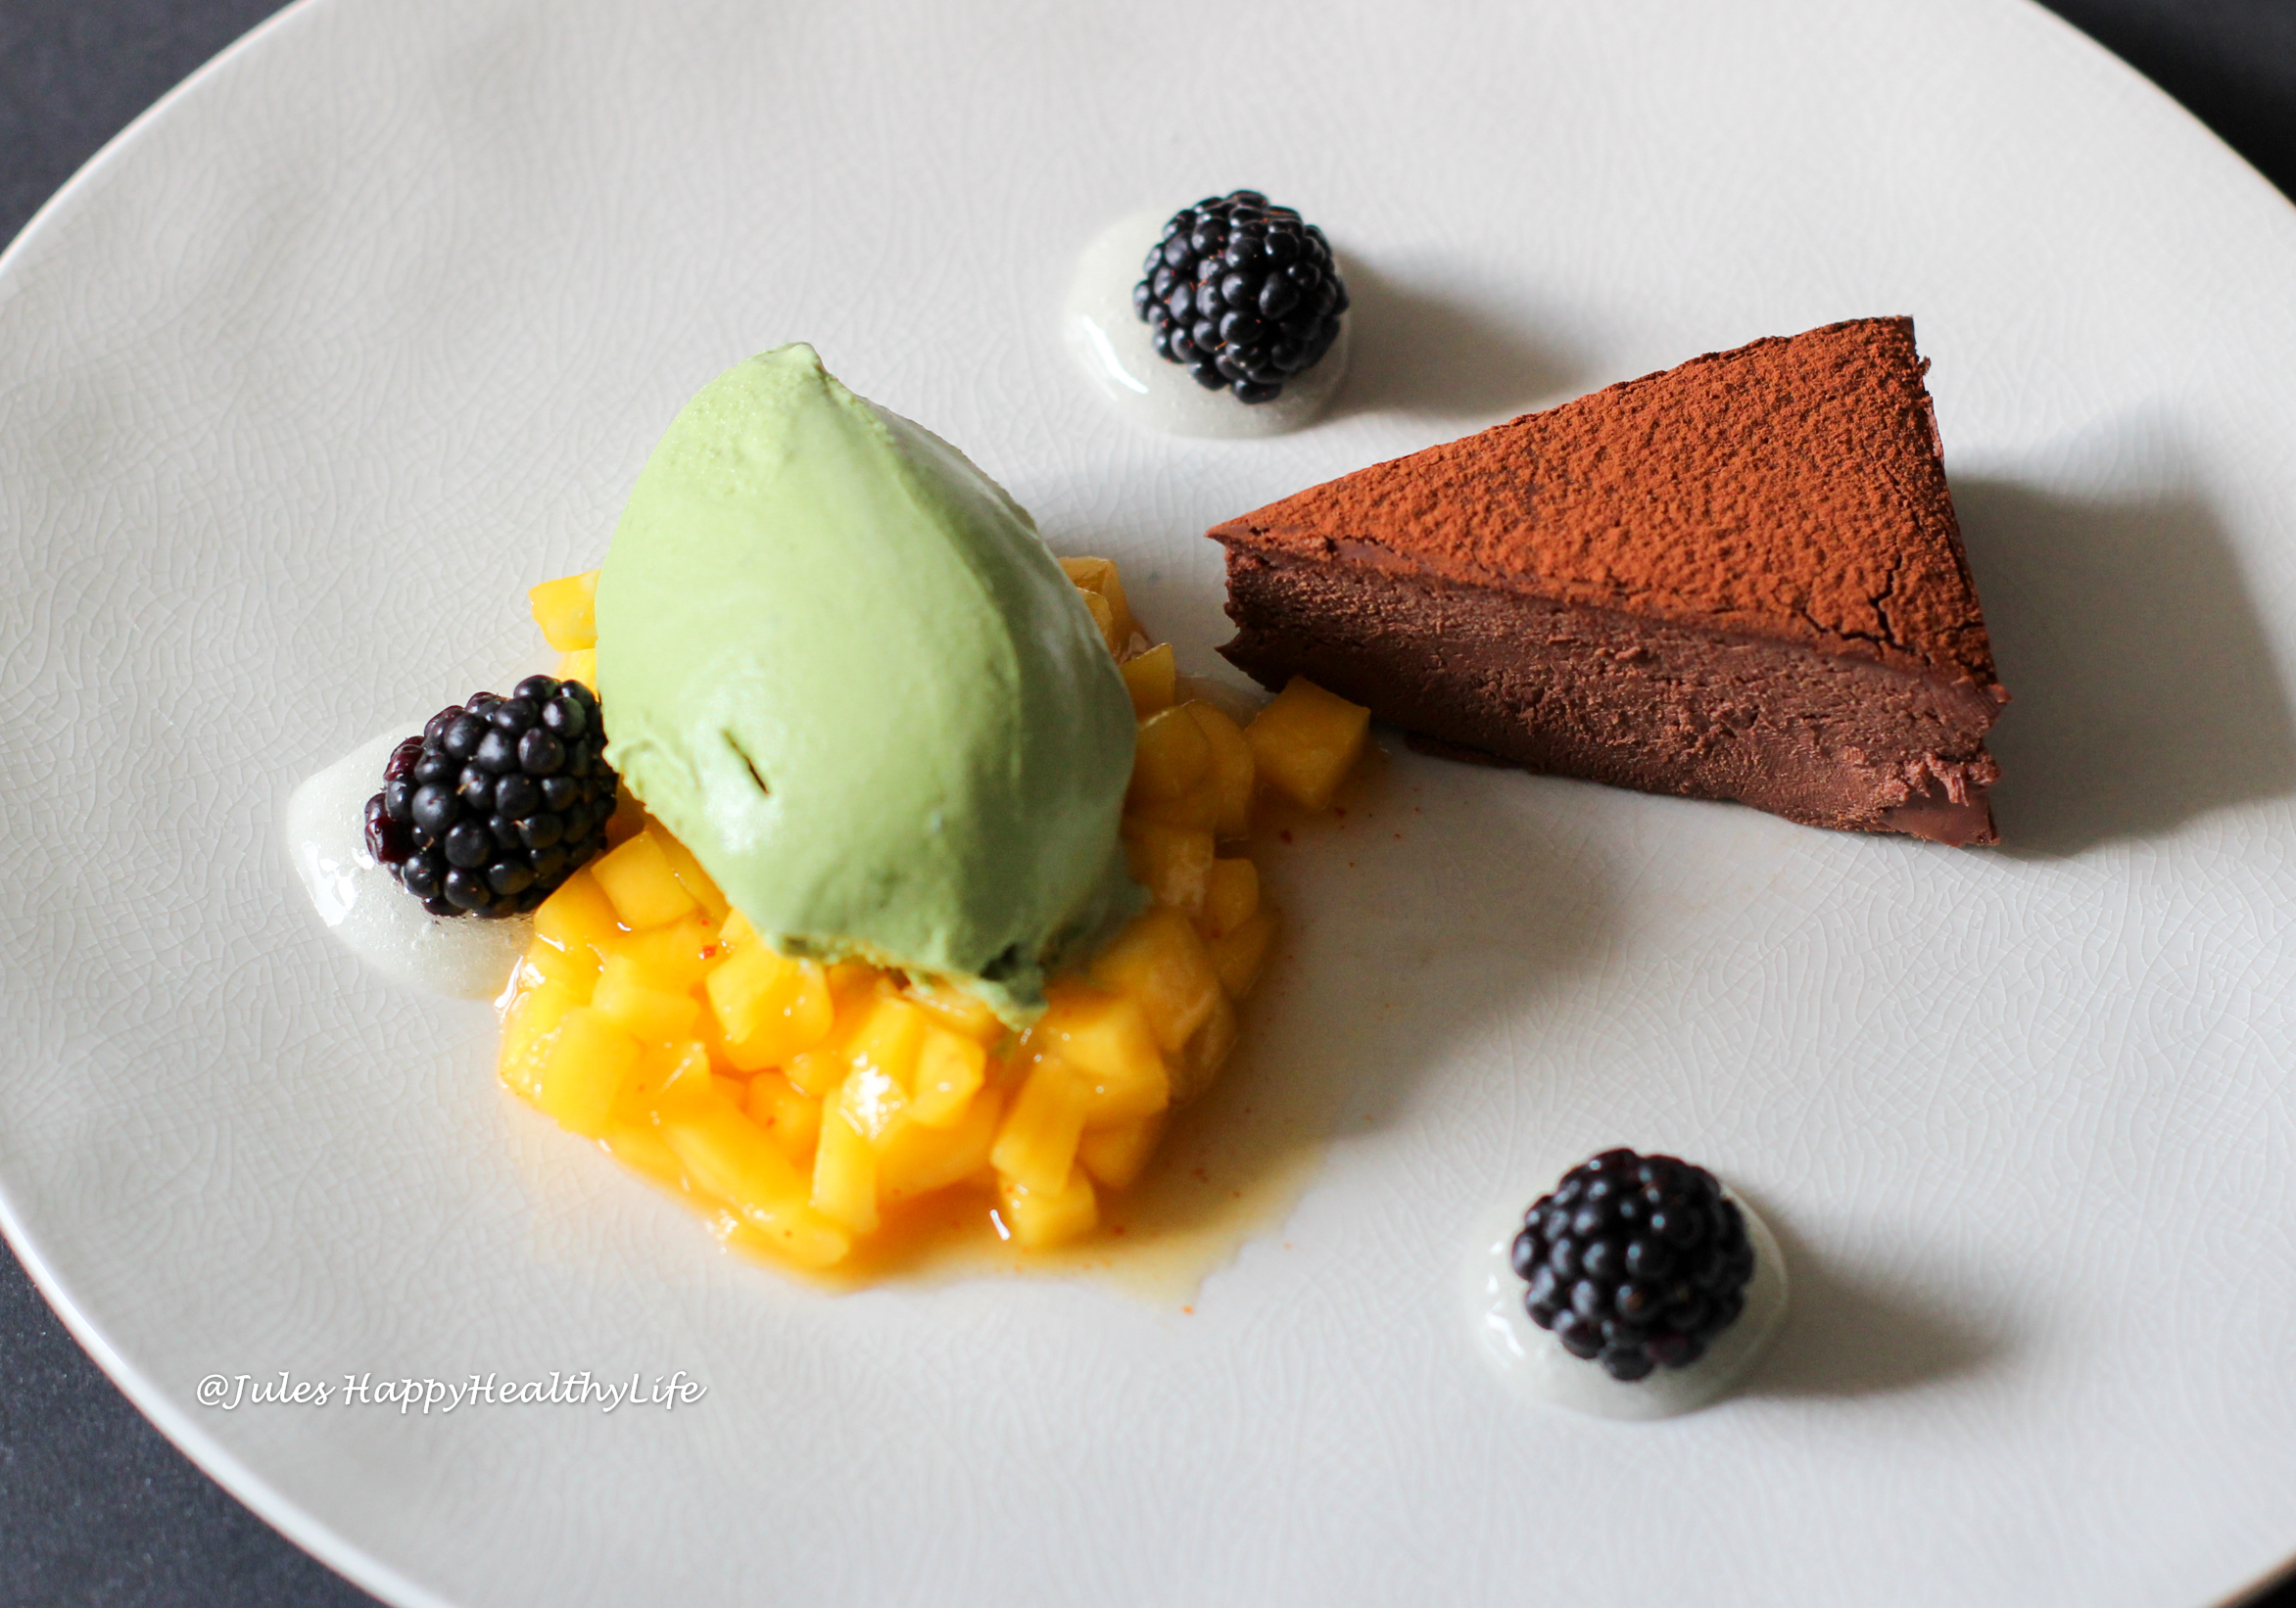 Impress guests with this Matcha Ice Cream with Chocolate Ganache Tarte and Mango Chili Chutney and Lemon Gel